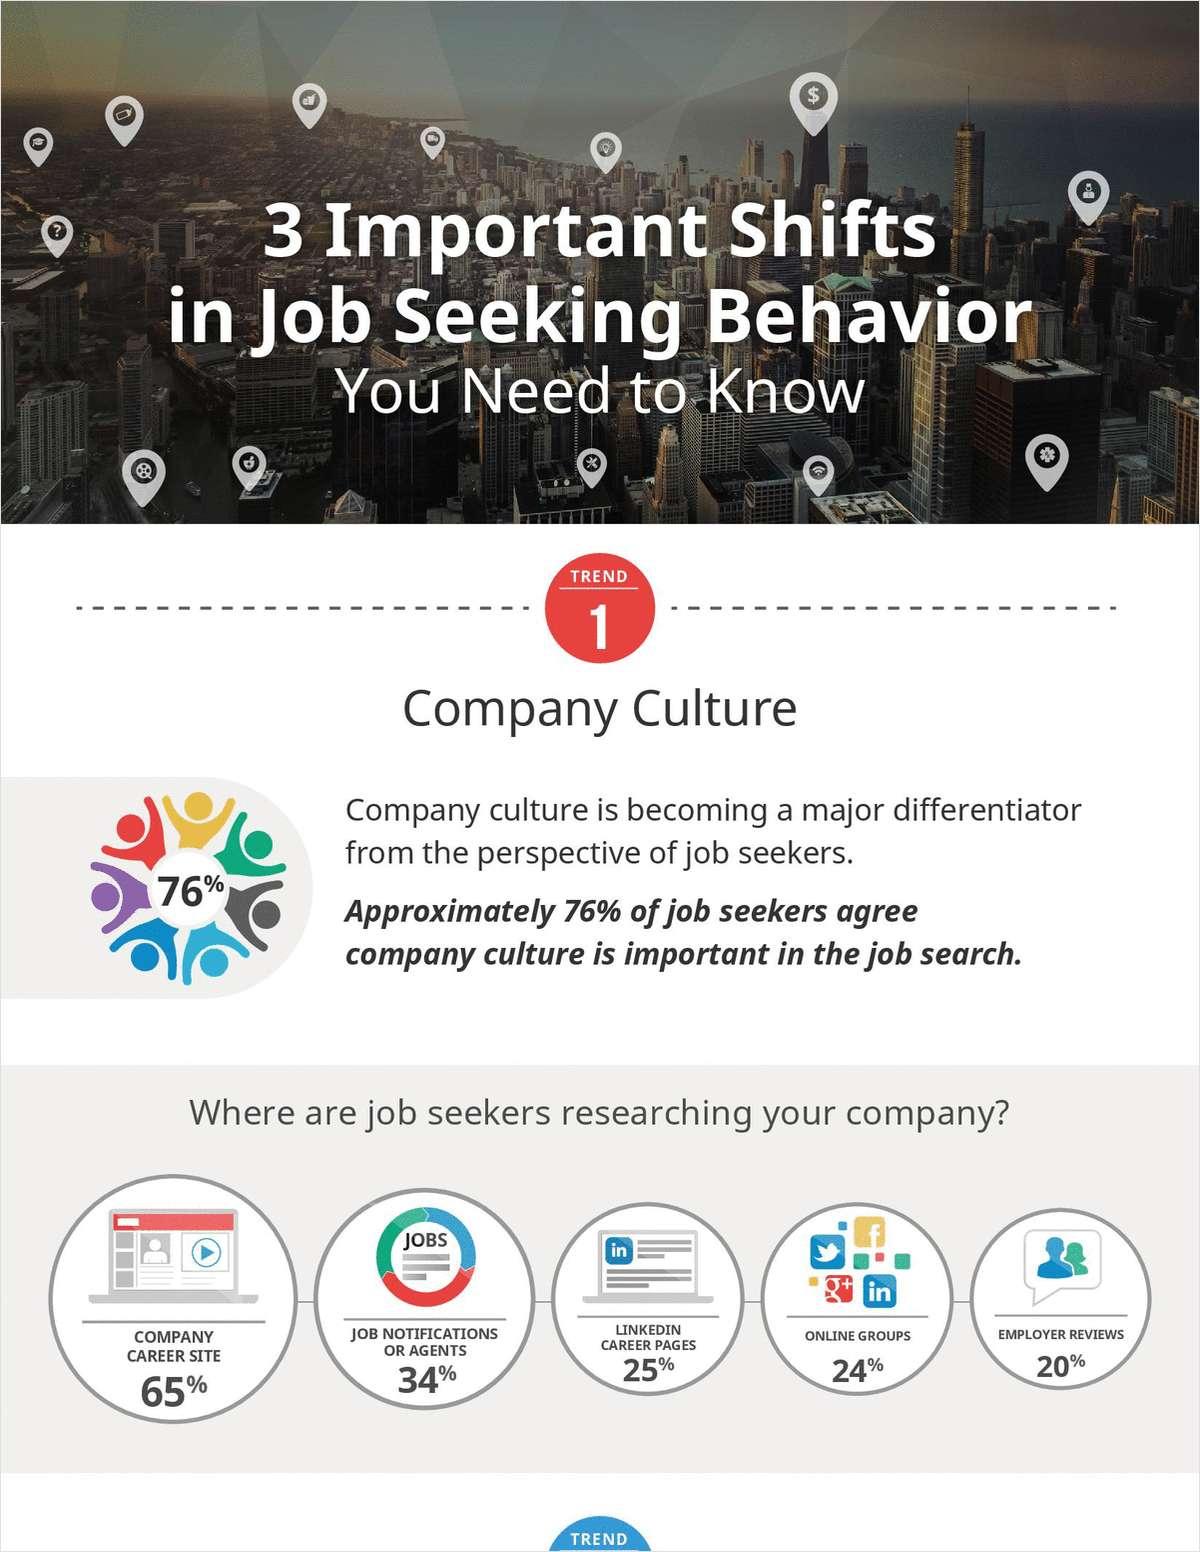 3 Important Shifts in Job Seeking Behavior